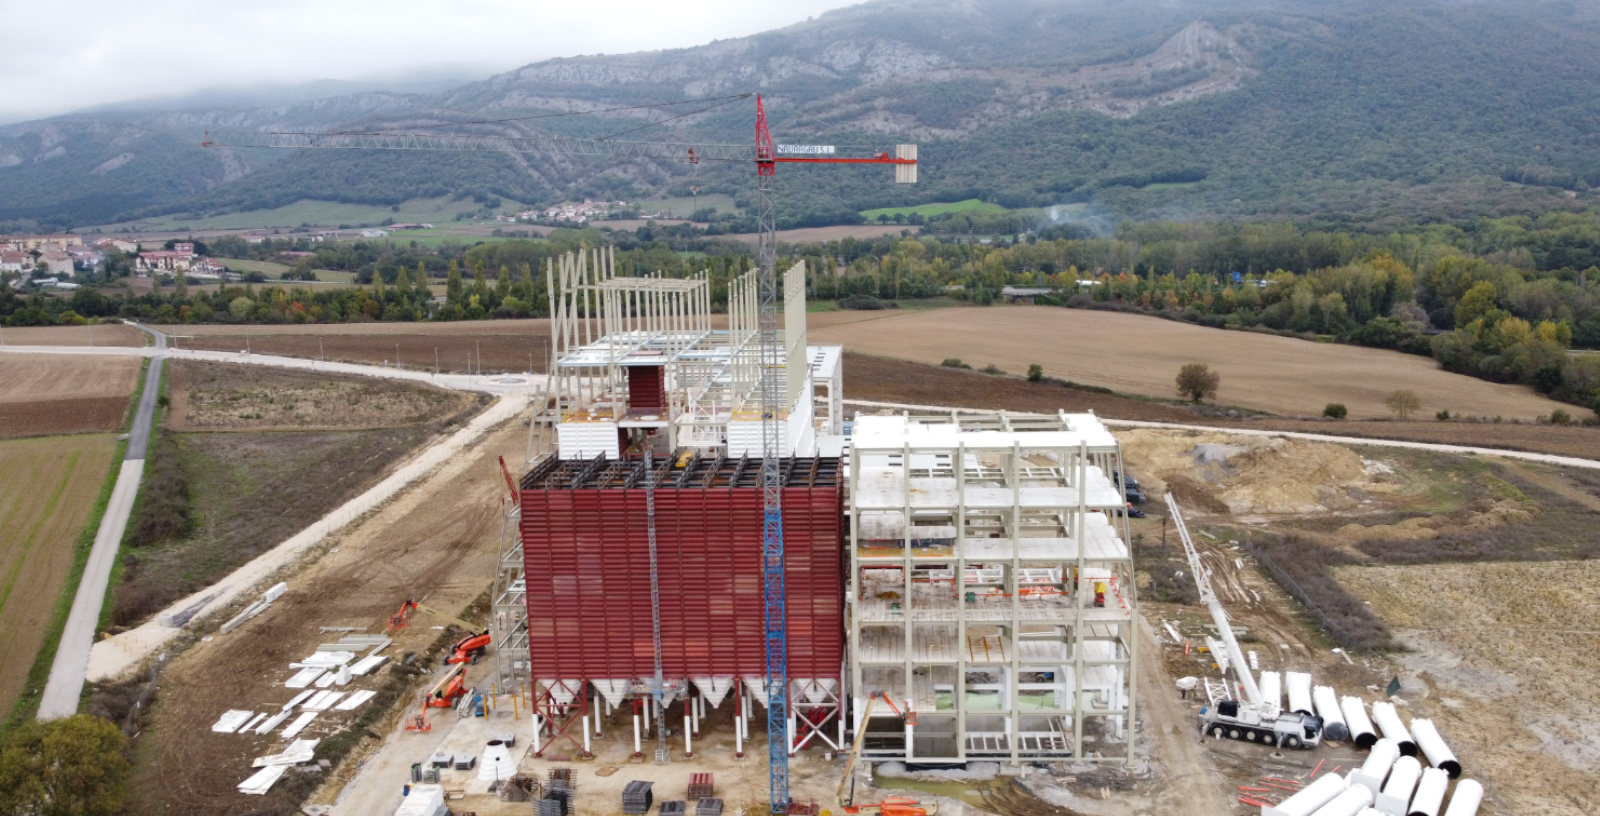 Oats_Manufacturing_Plant_Harivenasa_IDOM_08